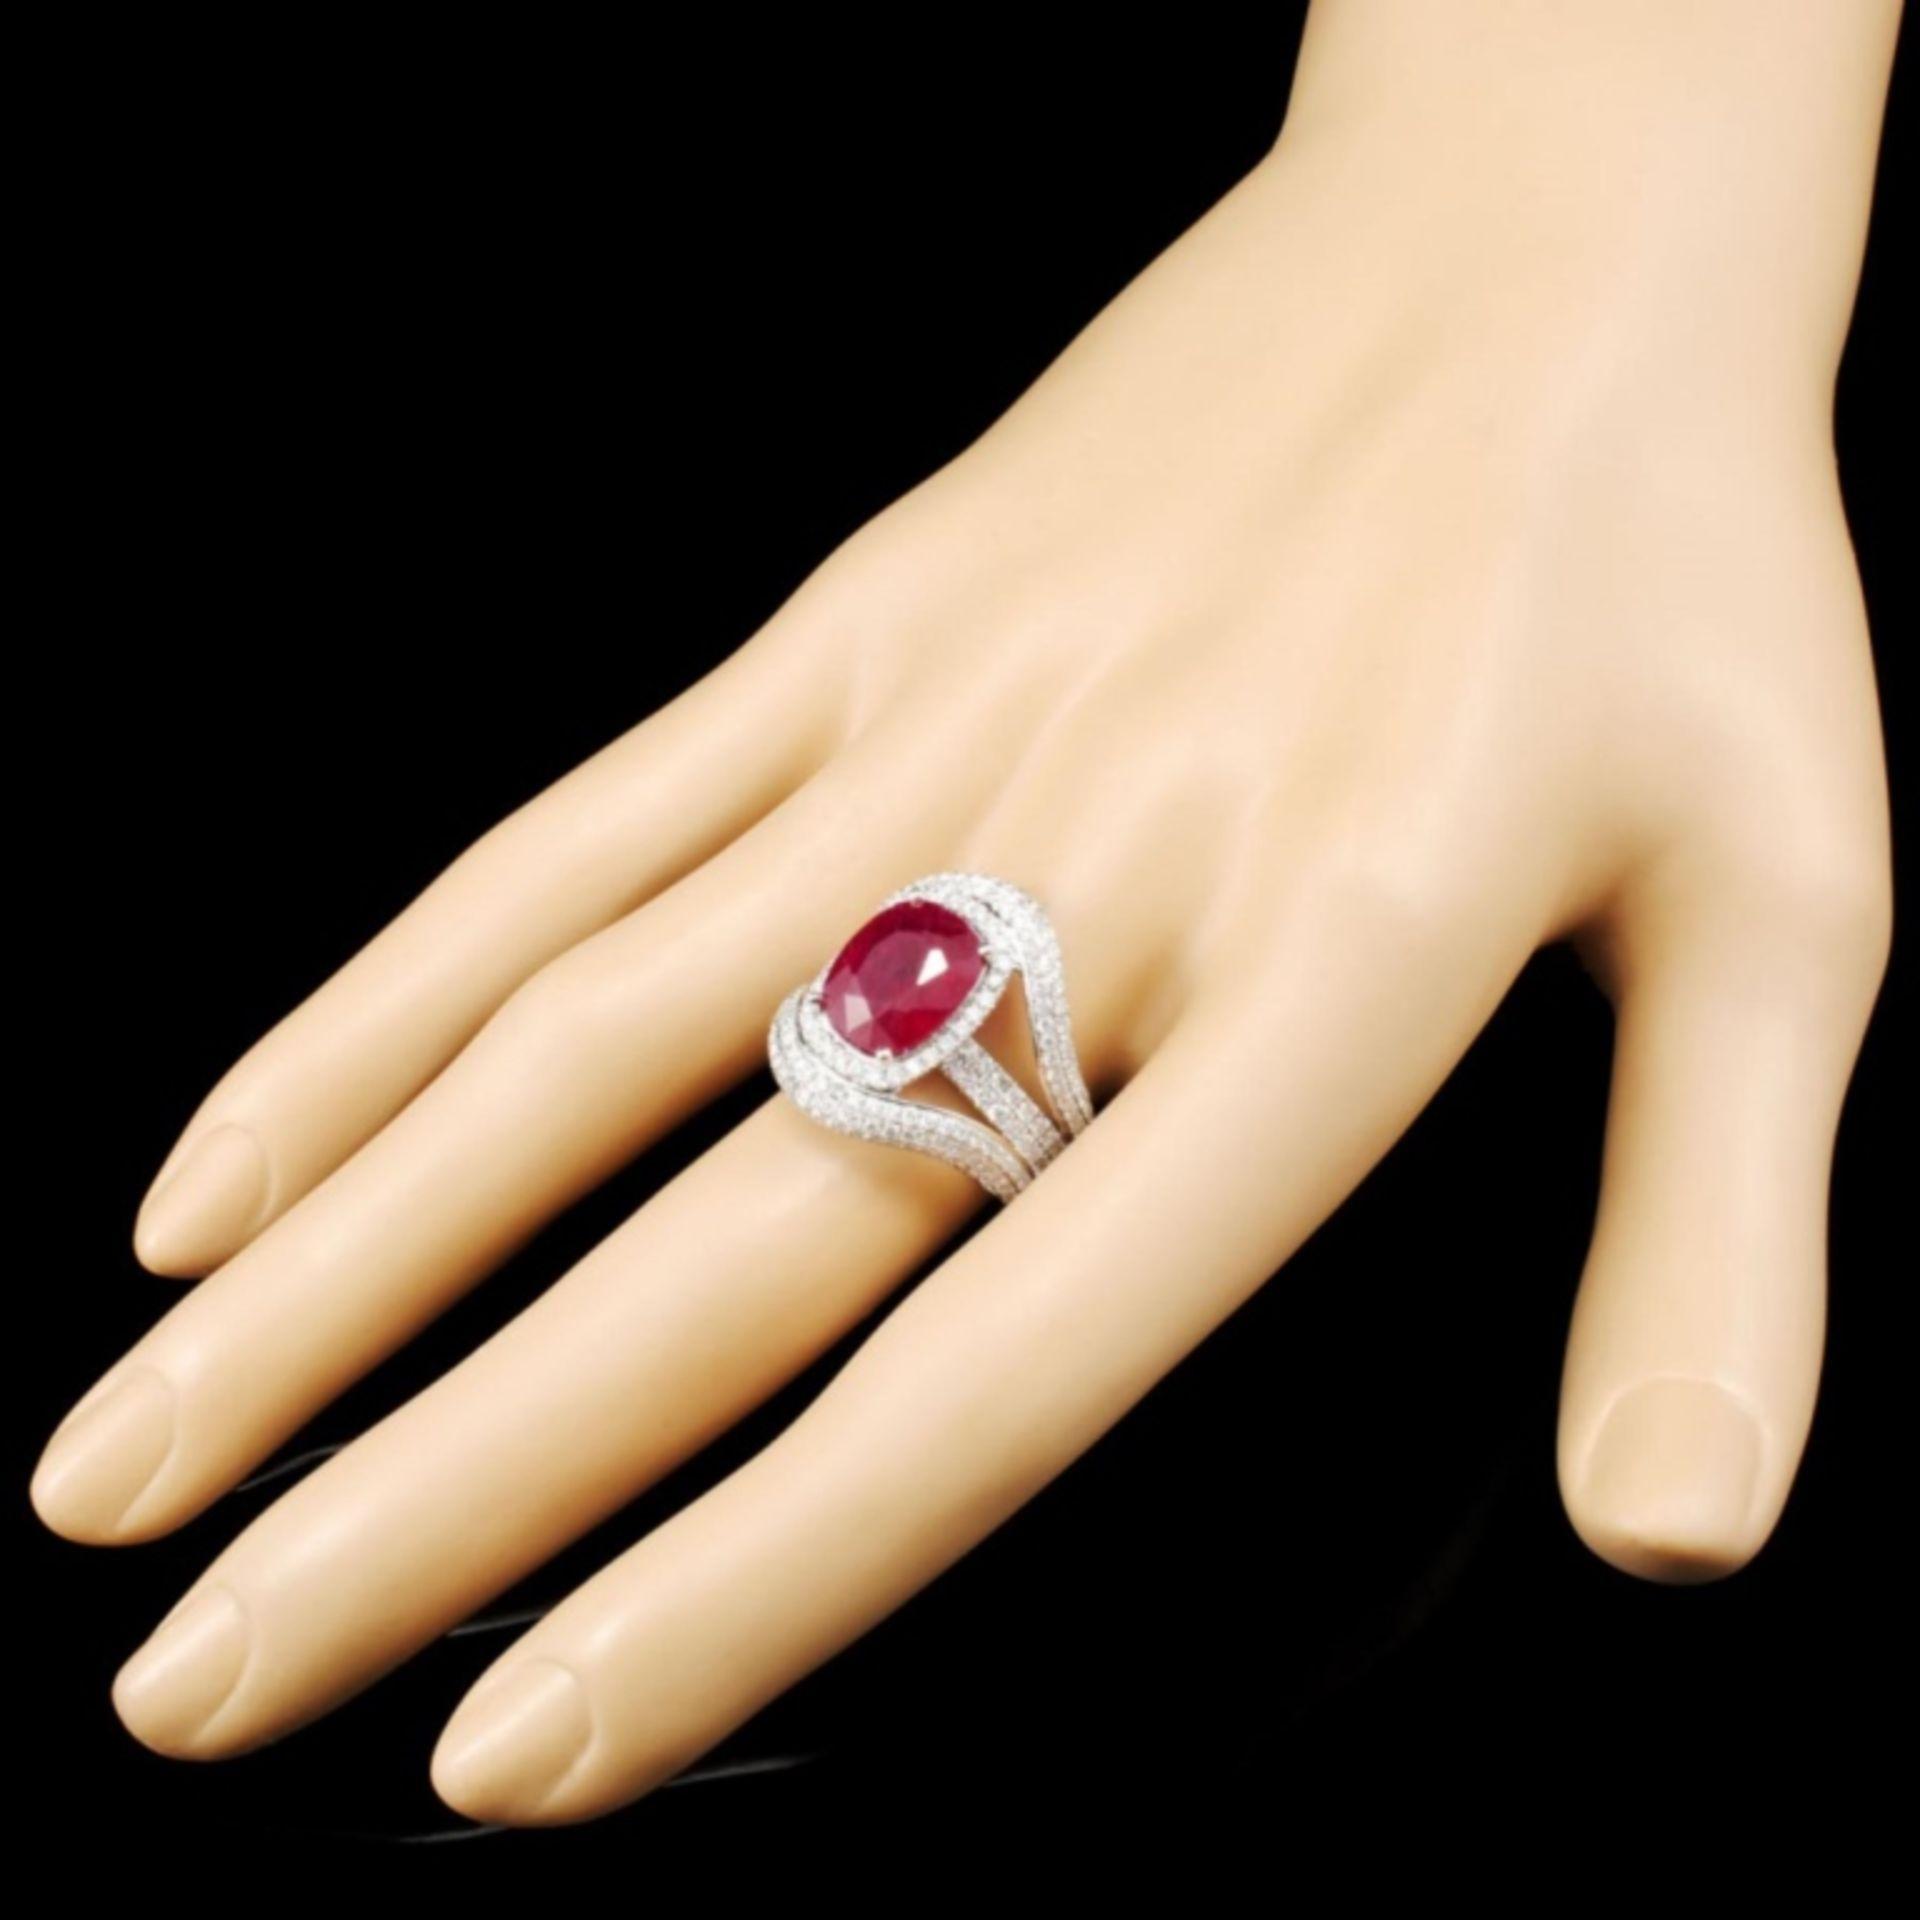 18K Gold 5.17ct Ruby & 1.95ctw Diamond Ring - Image 3 of 5